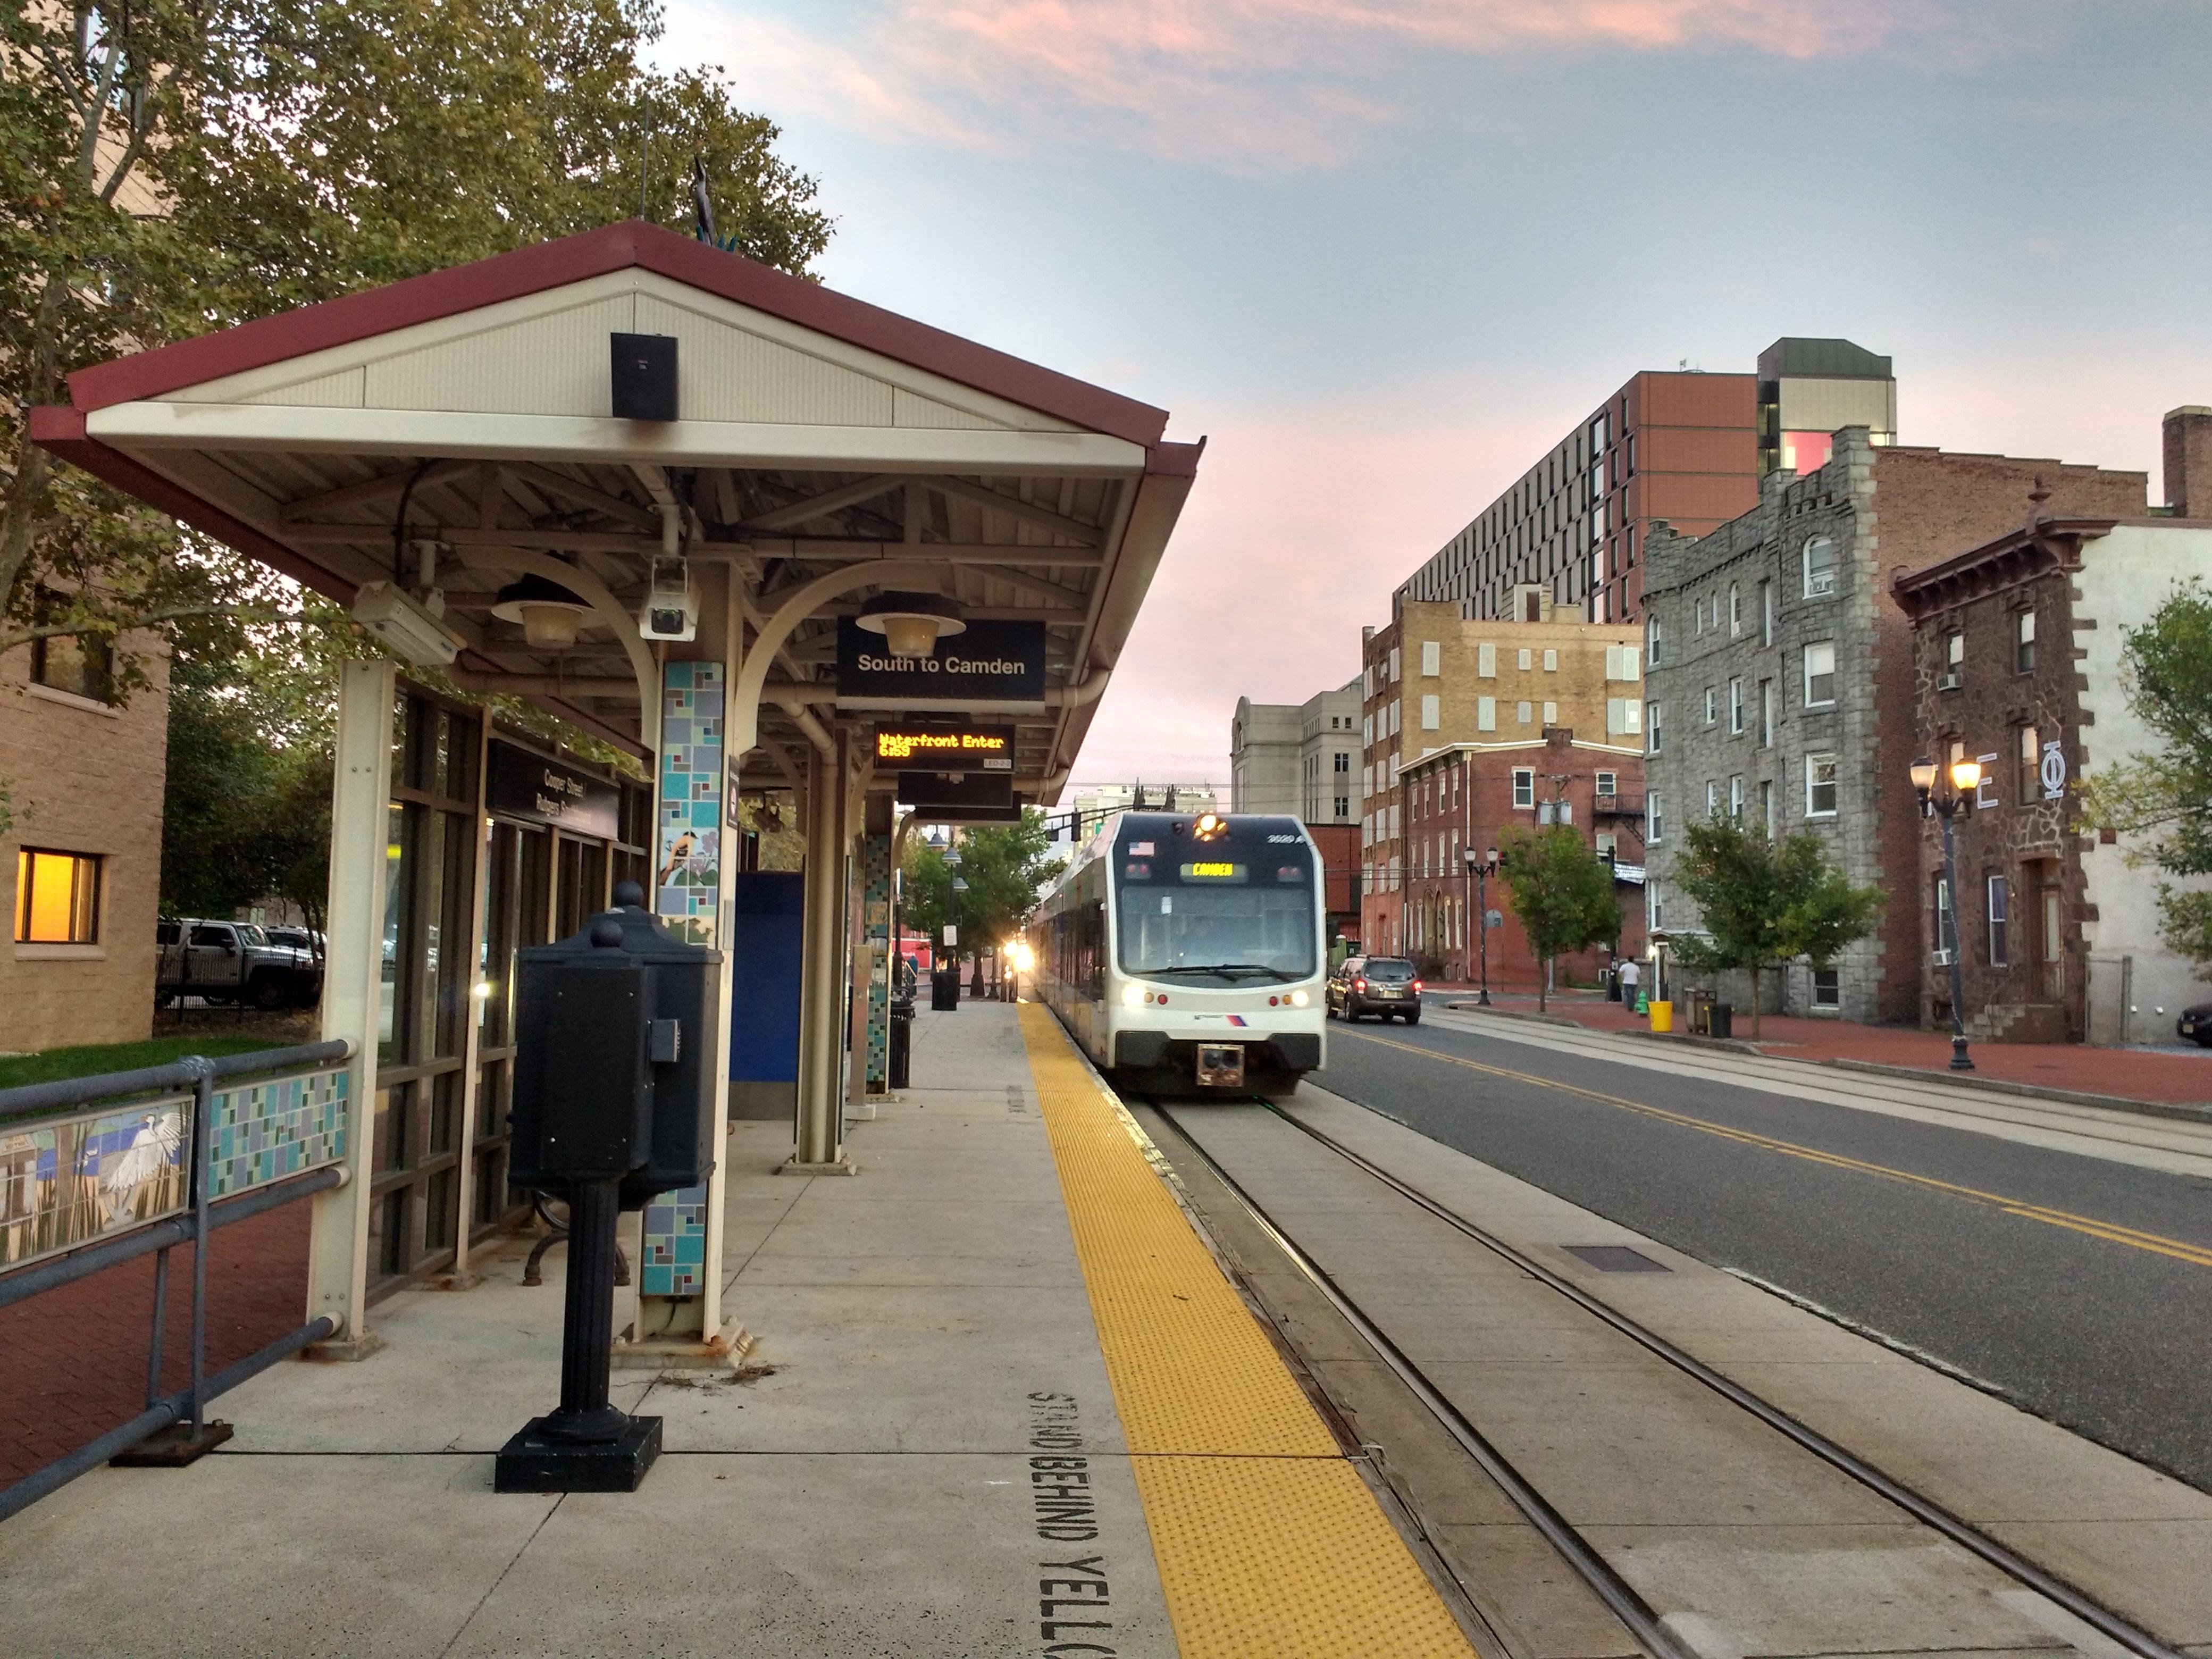 Cooper Street Rutgers University River Line station